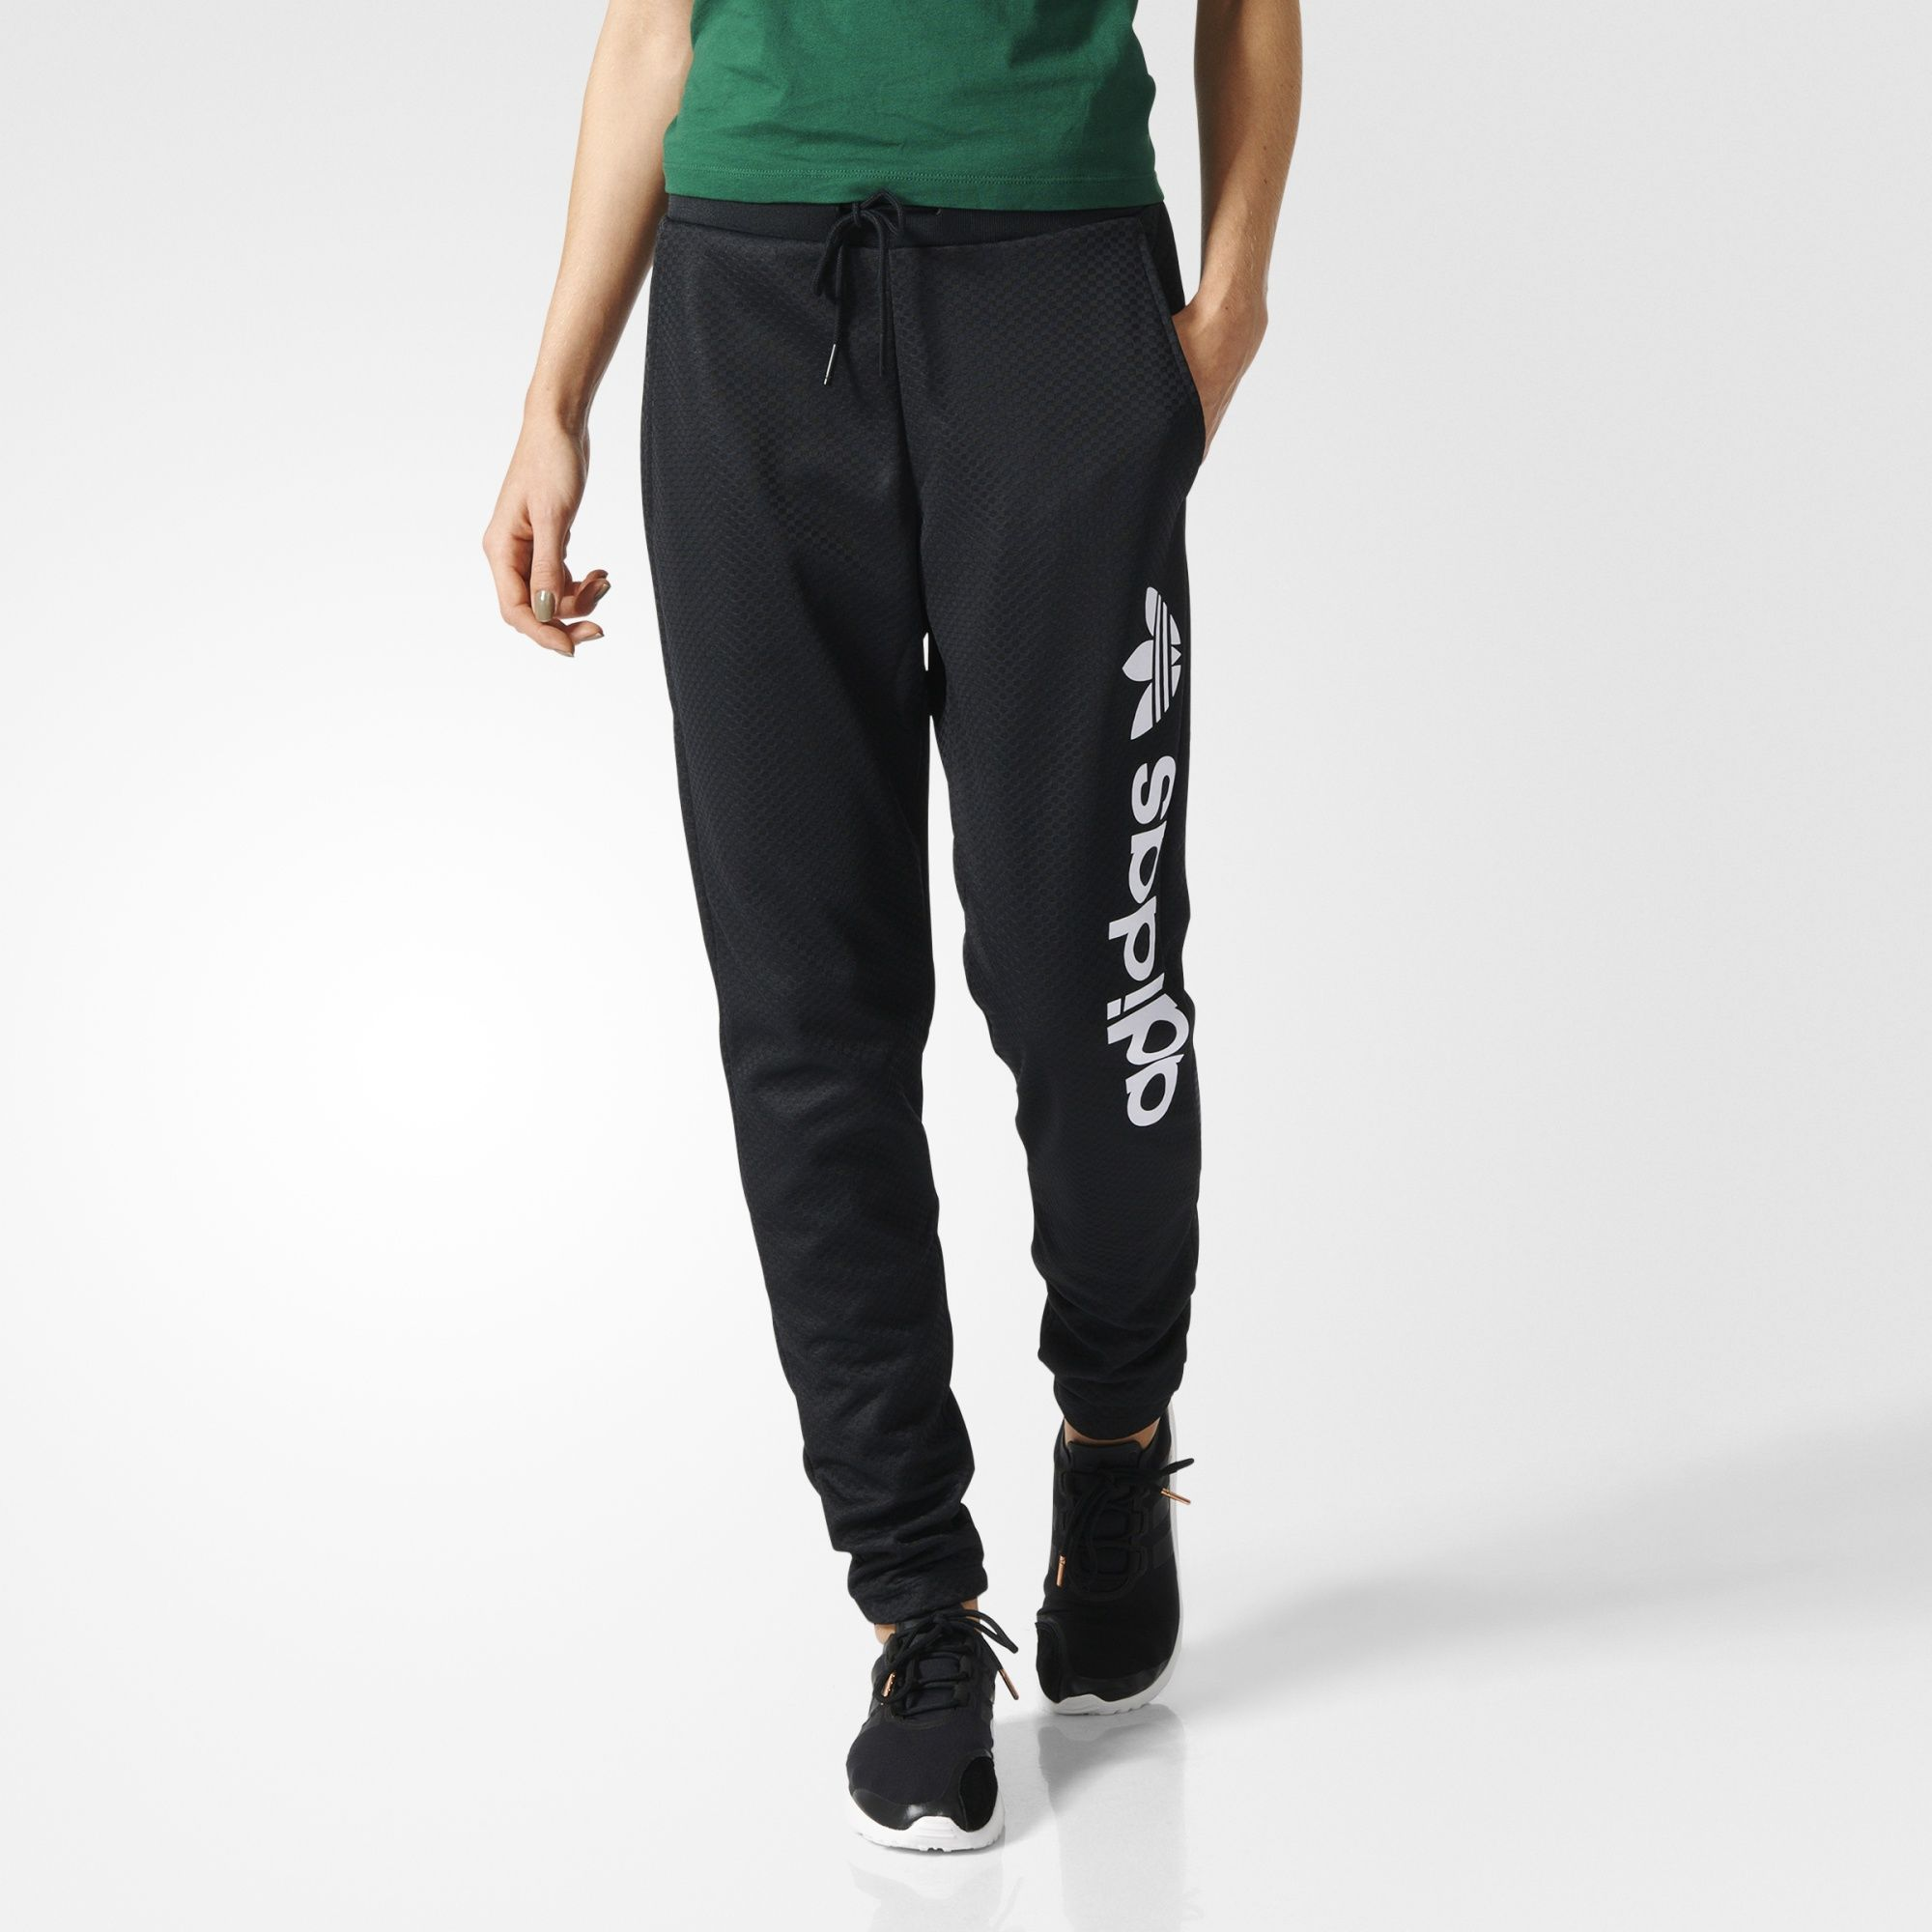 Adidas Originals Europa Track Pants Preto,loja adidas:www